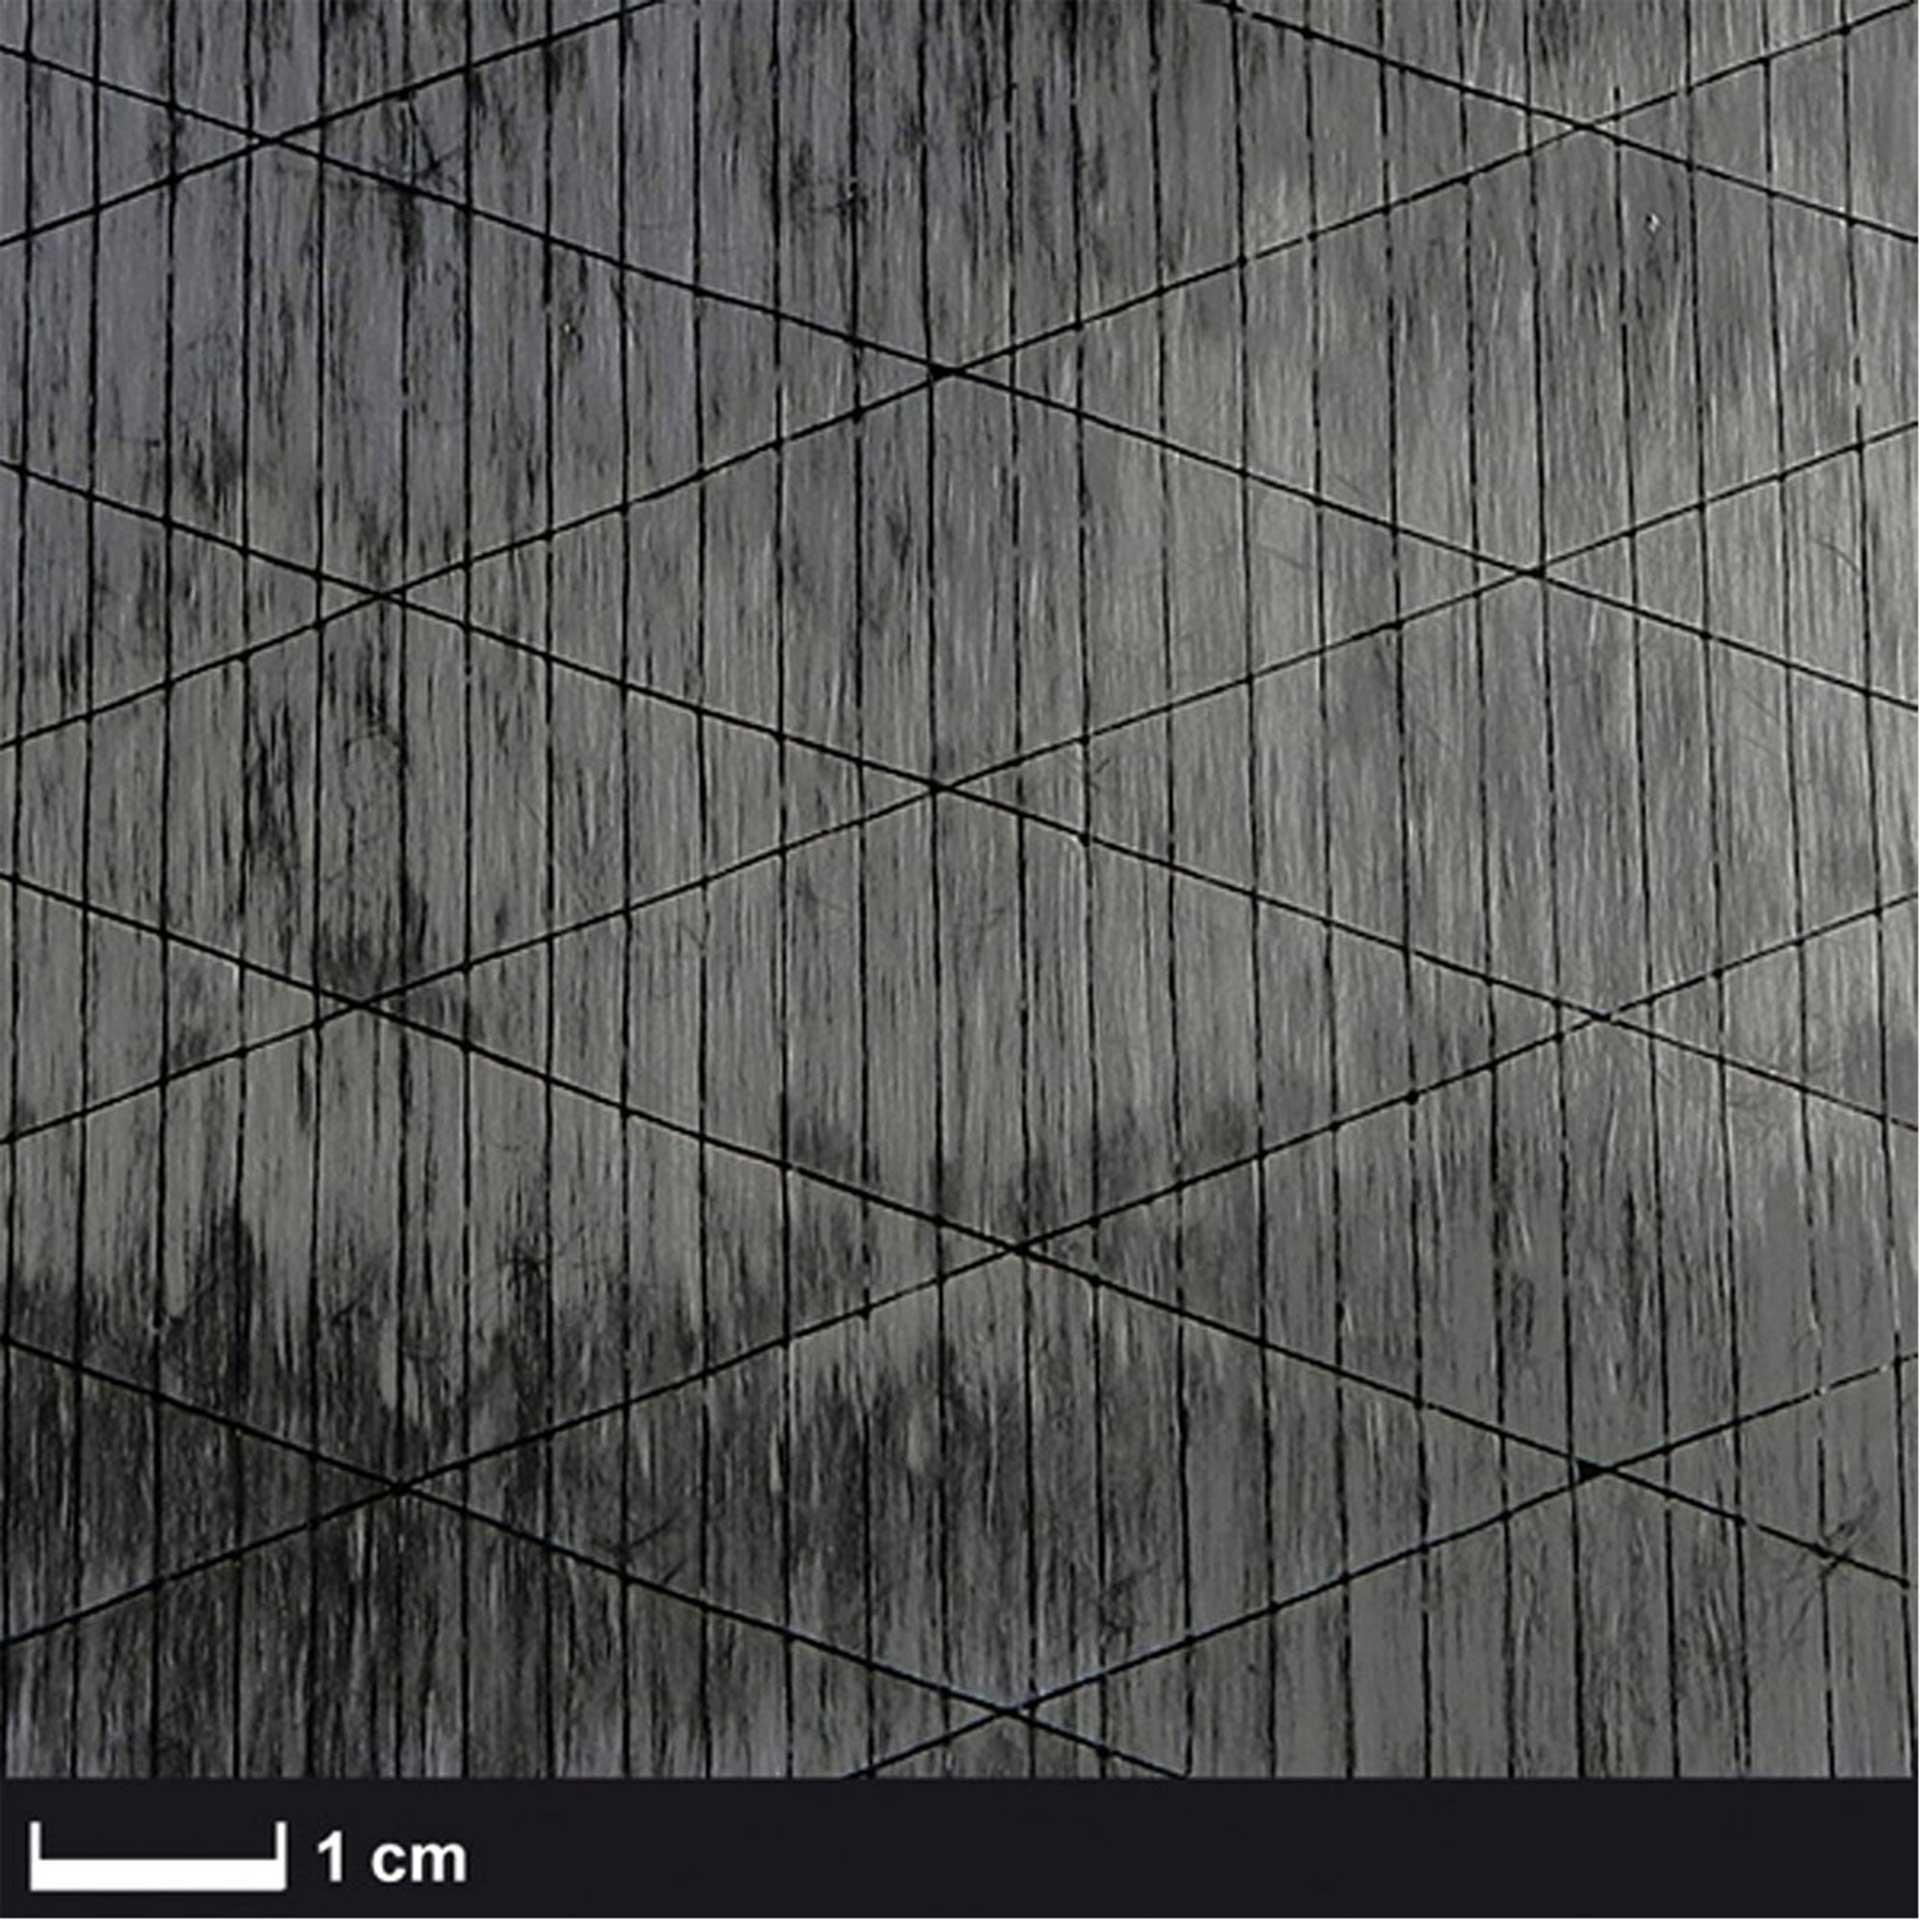 R&G KOHLEGELEGE ST, 80 G/M² (UD) 50 CM, ROLLE/ 5 MFLÄCHE = 2,5 M²